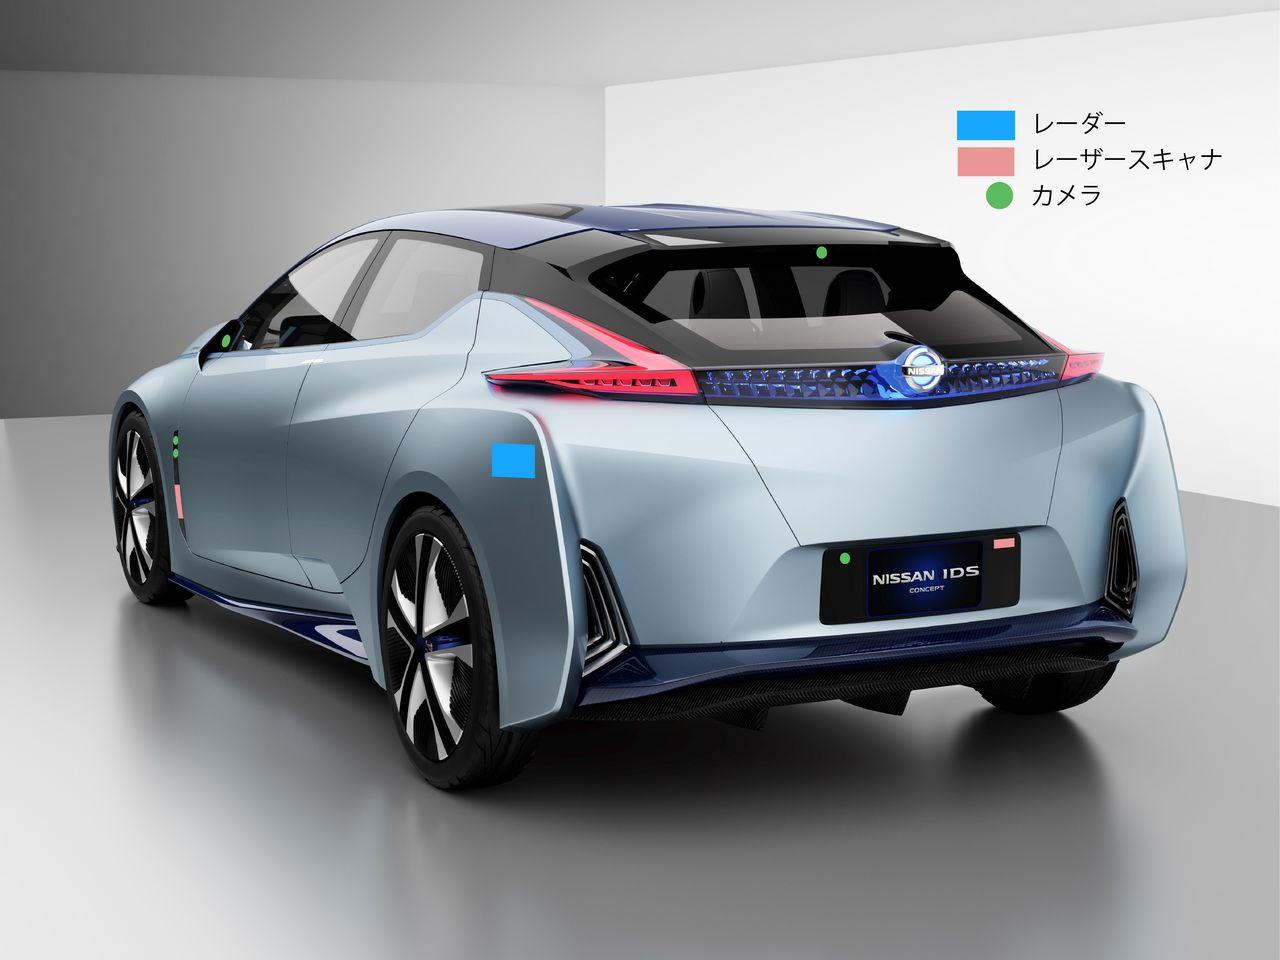 salone-di-tokio-2015-nissan-intelligent-driving-ids-concept-0-100_34